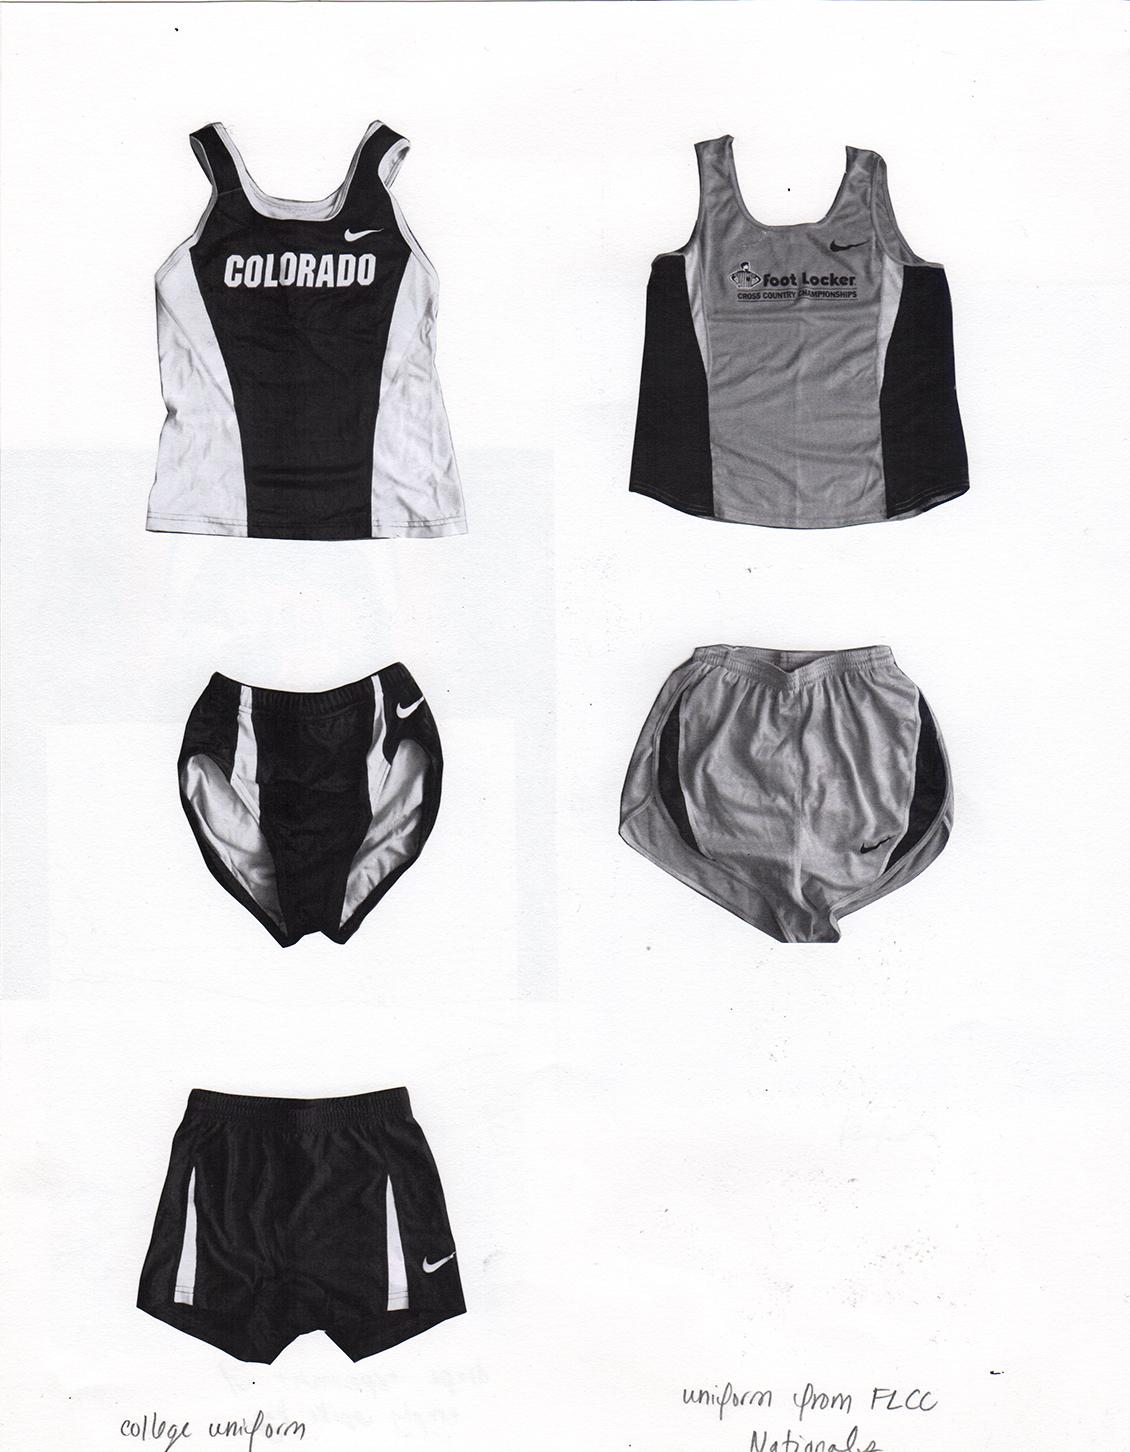 uniforms_web.jpg